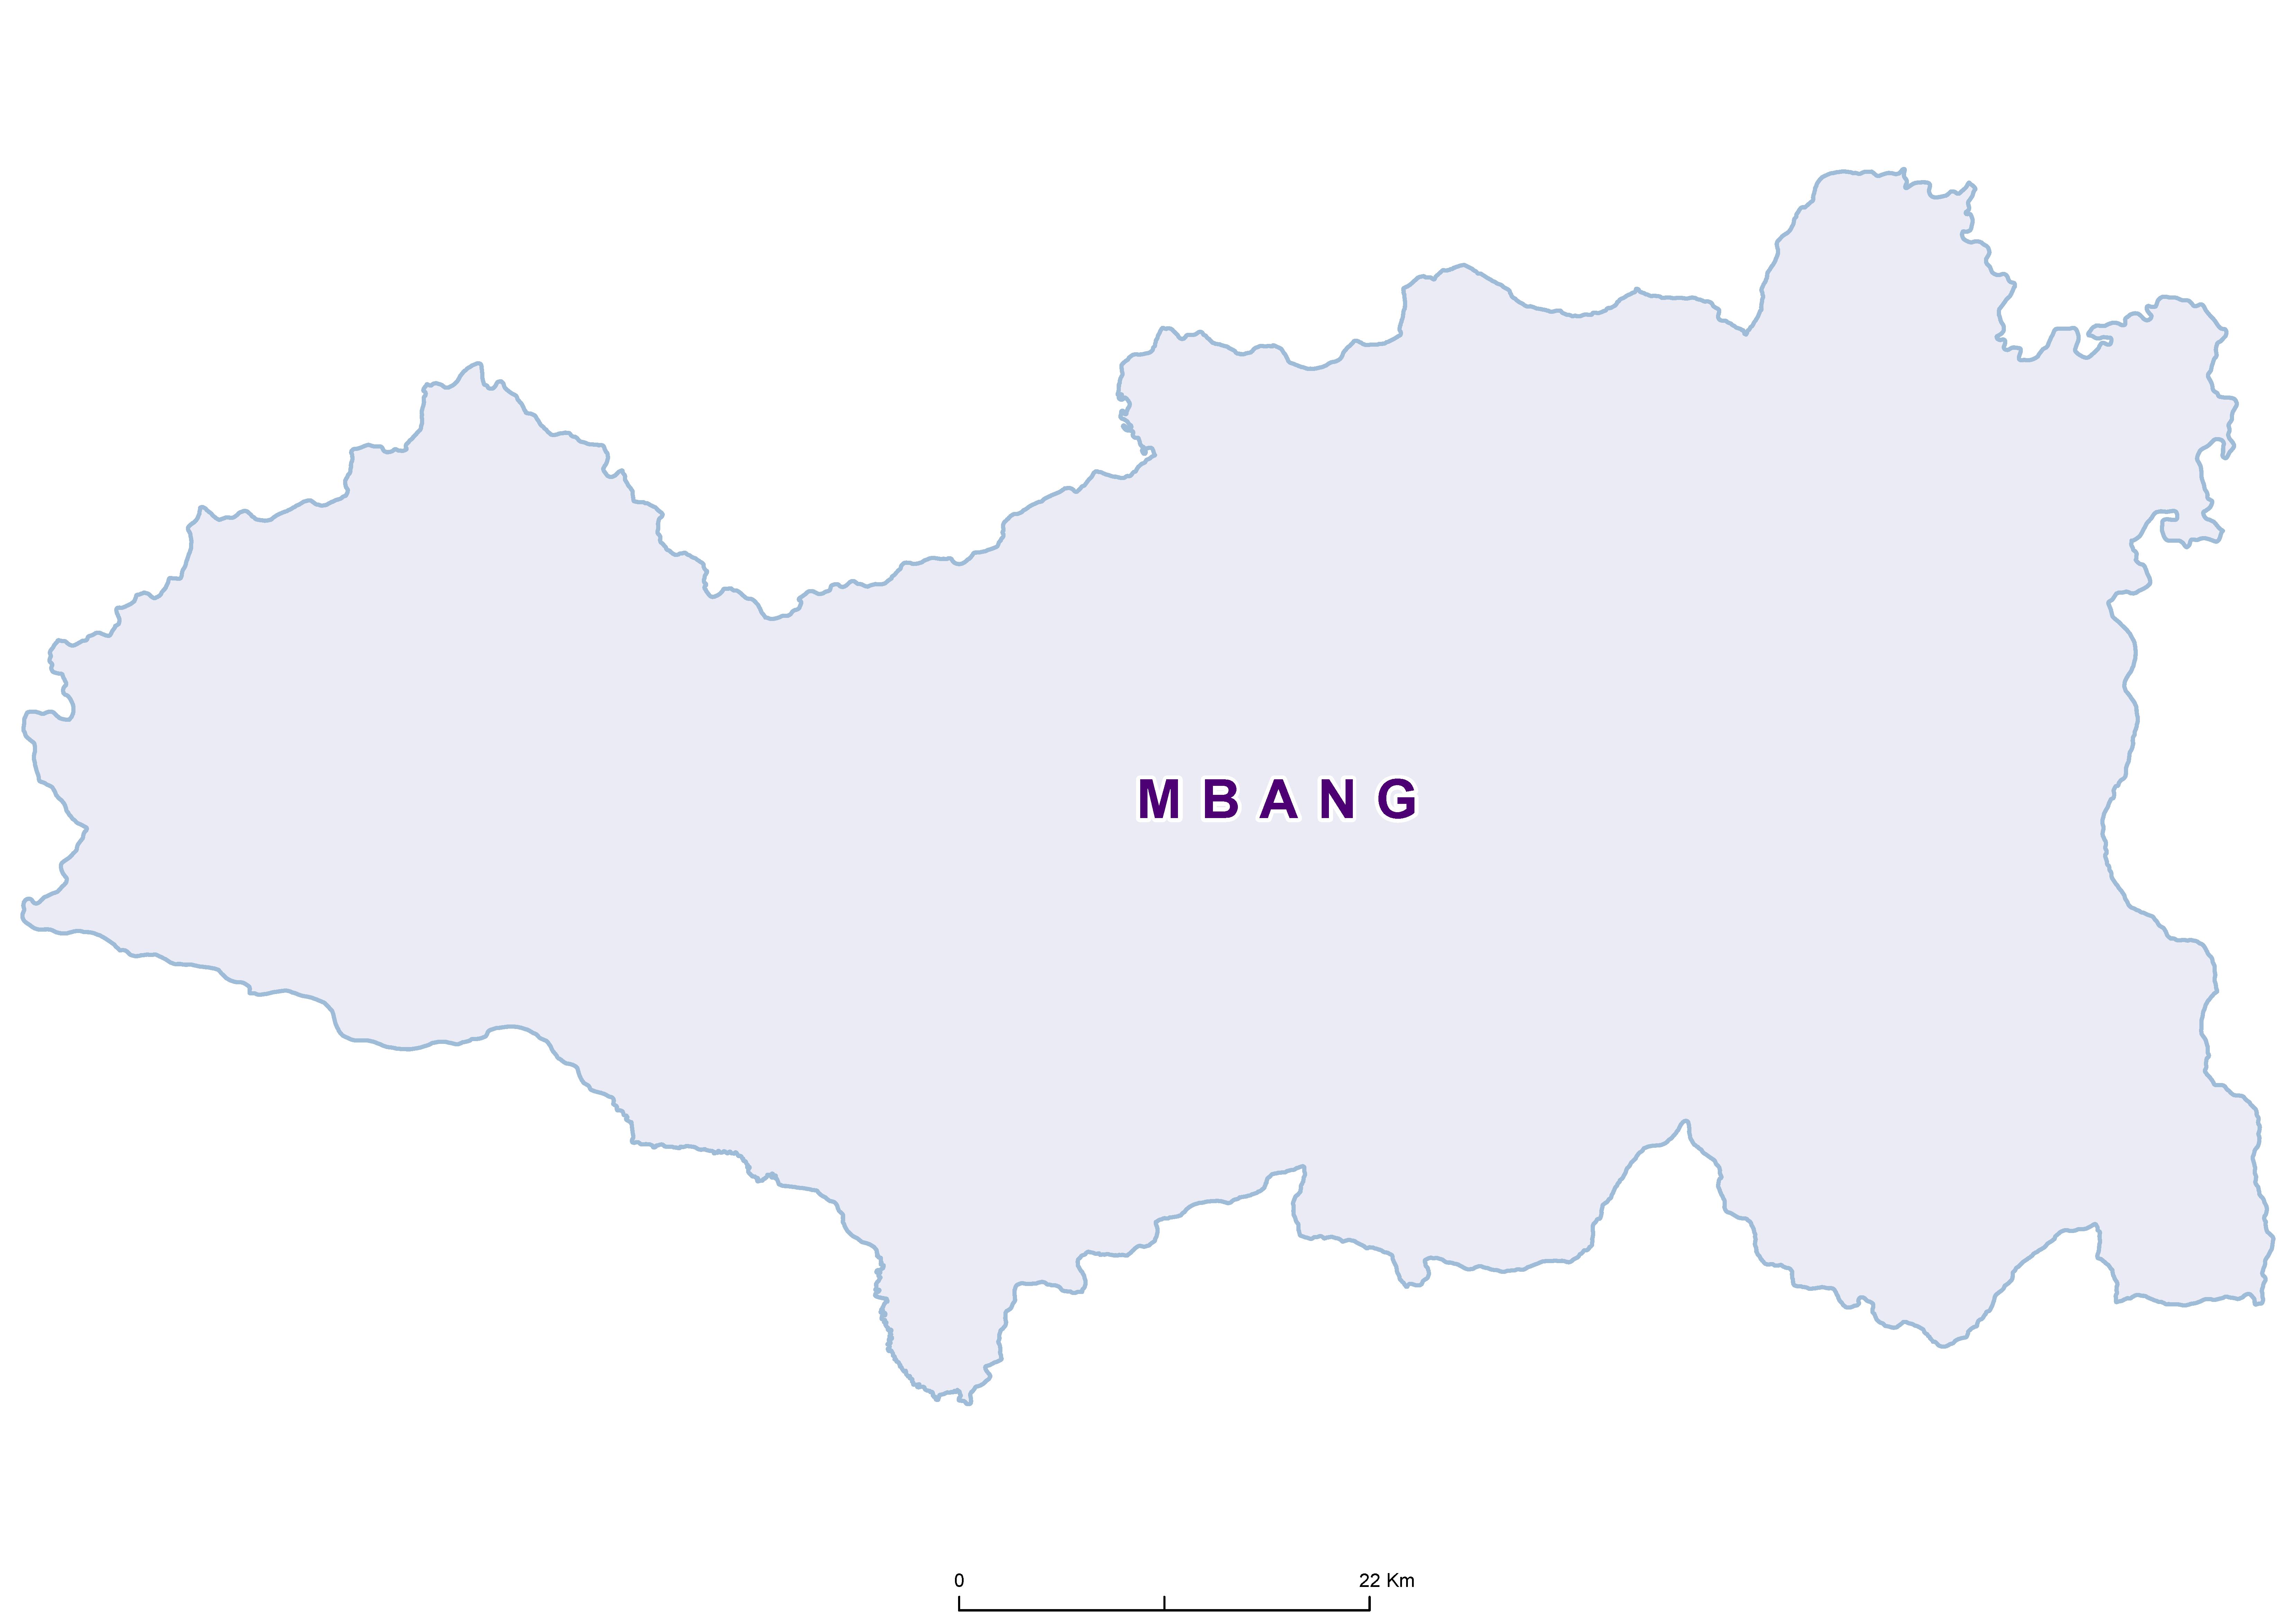 Mbang Mean SCH 20180001